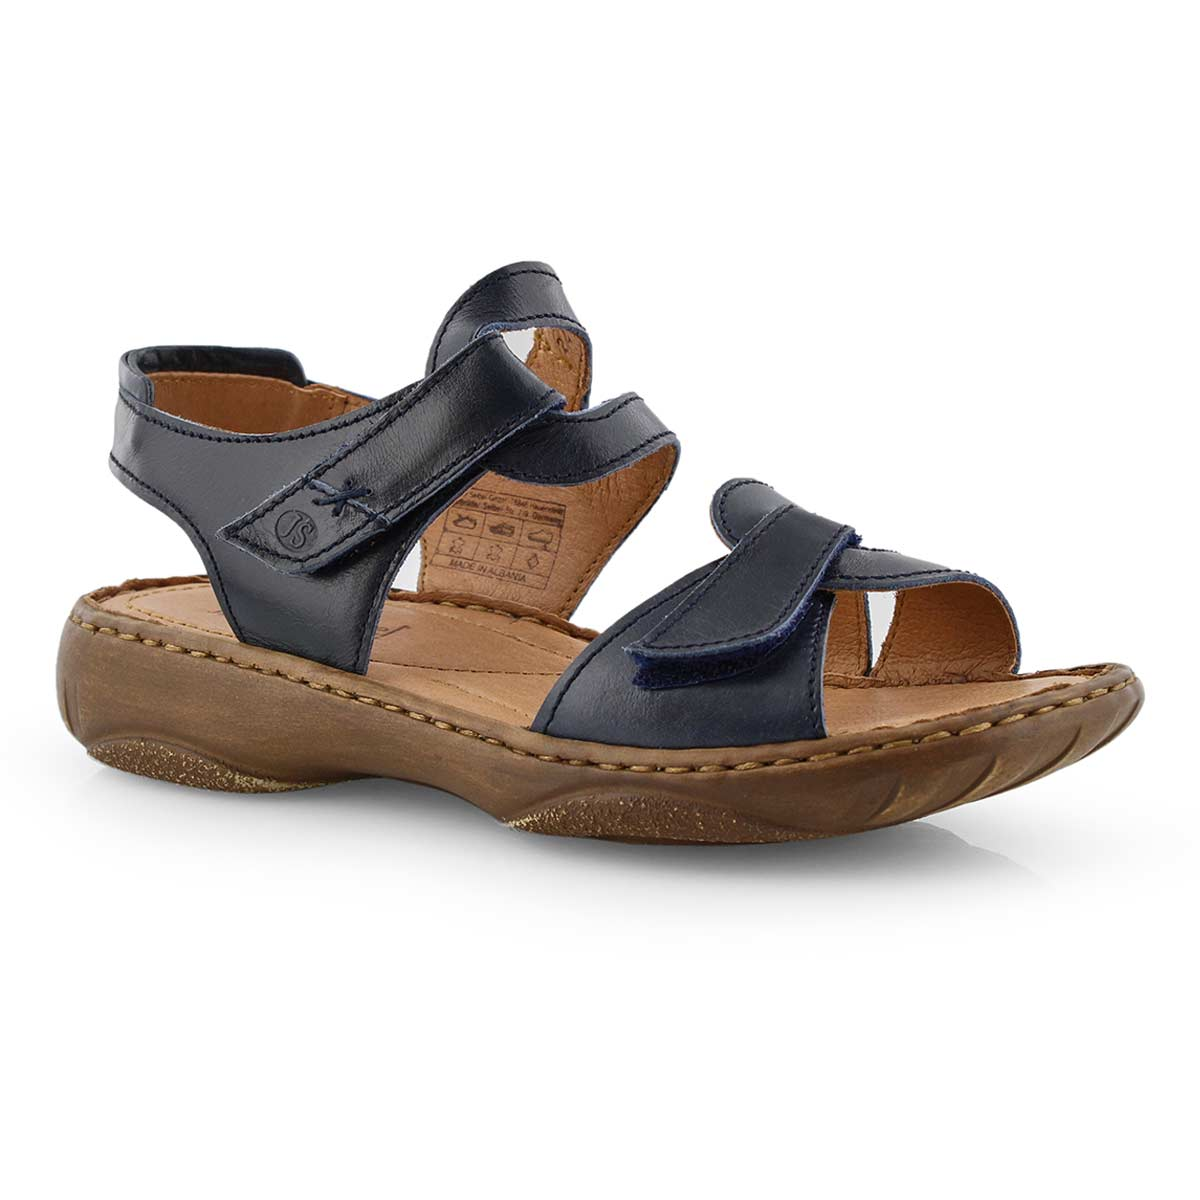 Lds Debra 39 jeans casual 2 strap sandal